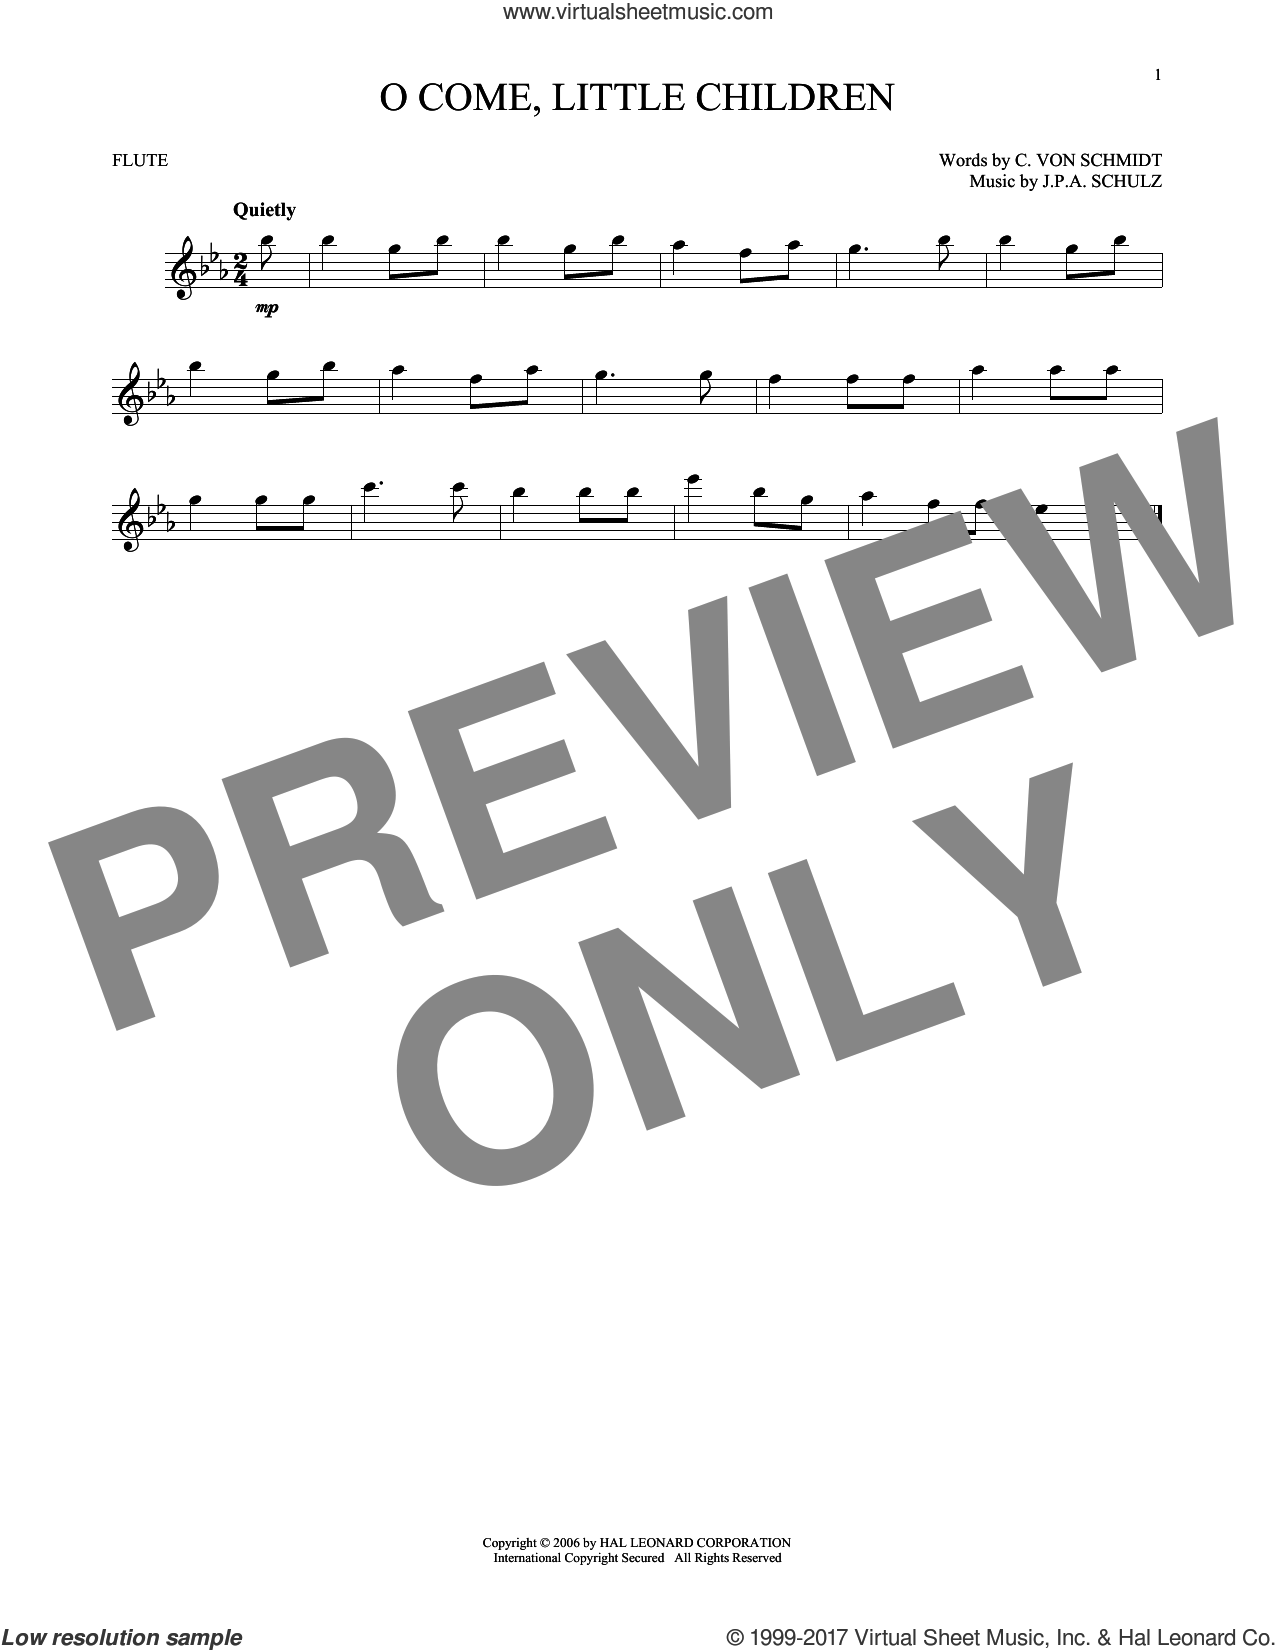 O Come, Little Children sheet music for flute solo by J.A.P. Schulz and Cristoph Von Schmid, intermediate skill level